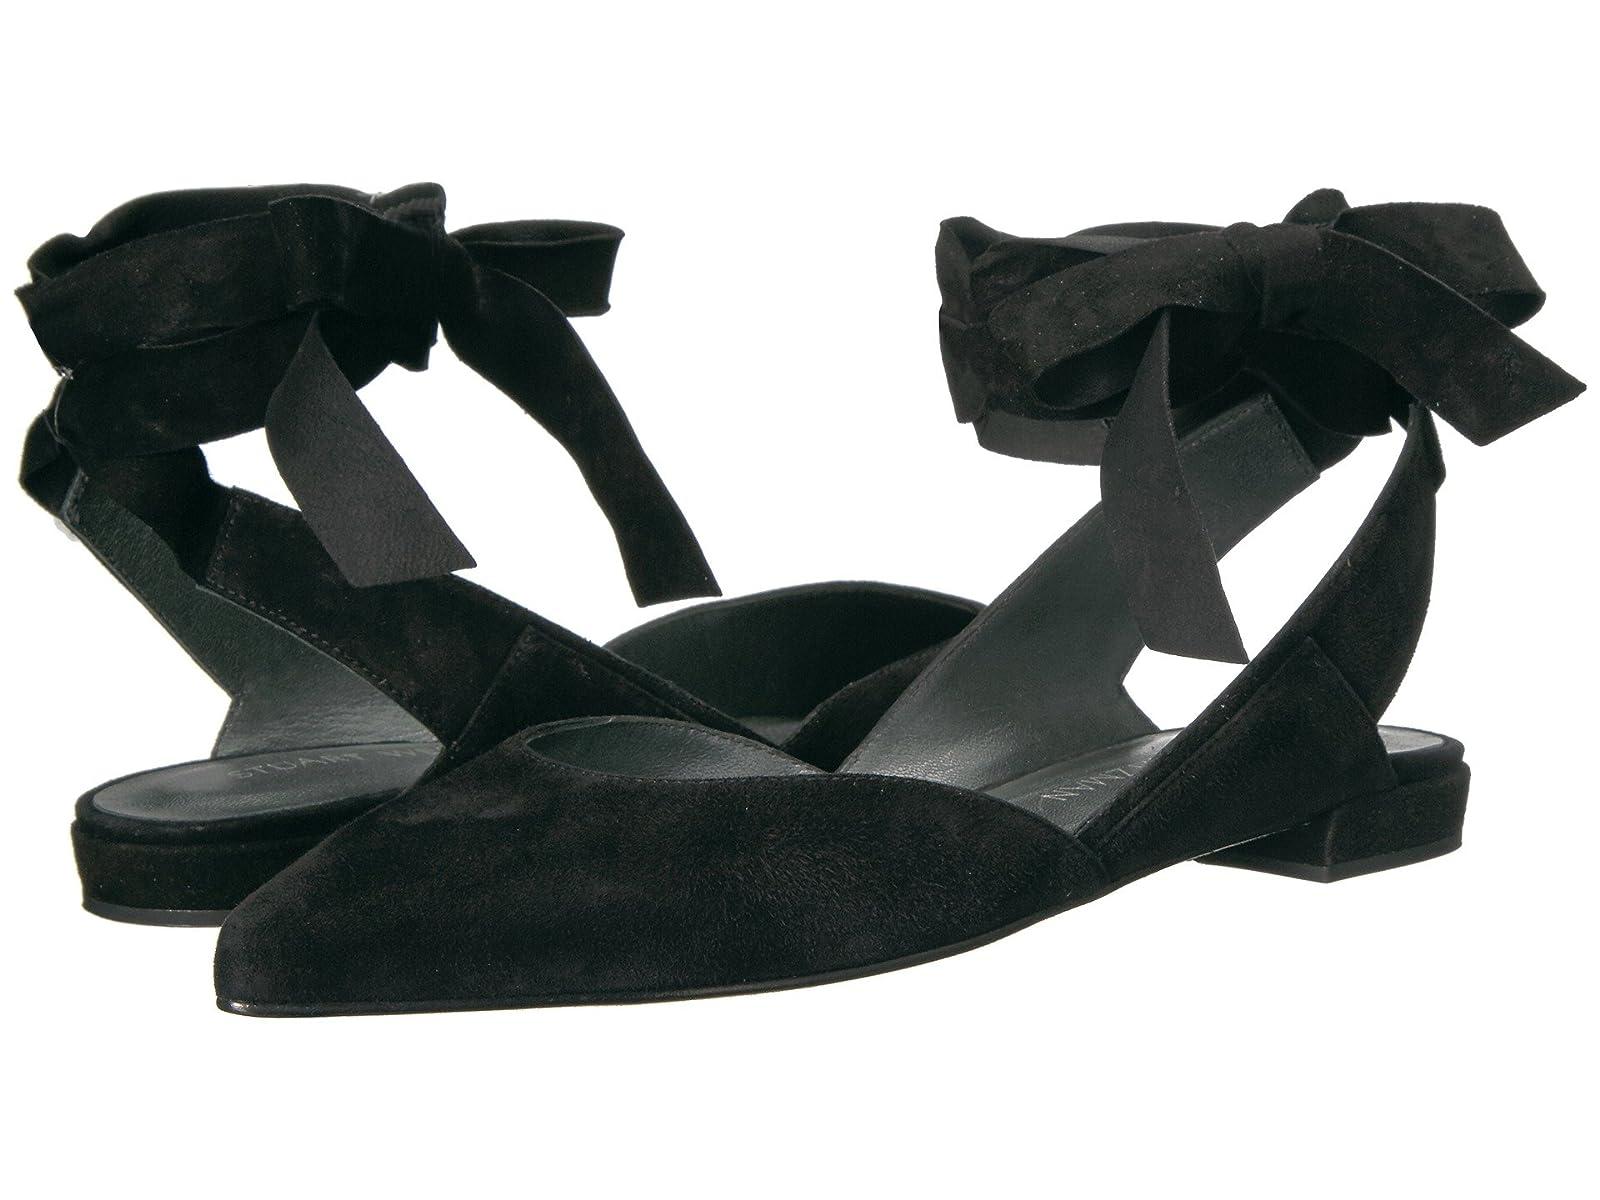 Stuart Weitzman SupersonicCheap and distinctive eye-catching shoes